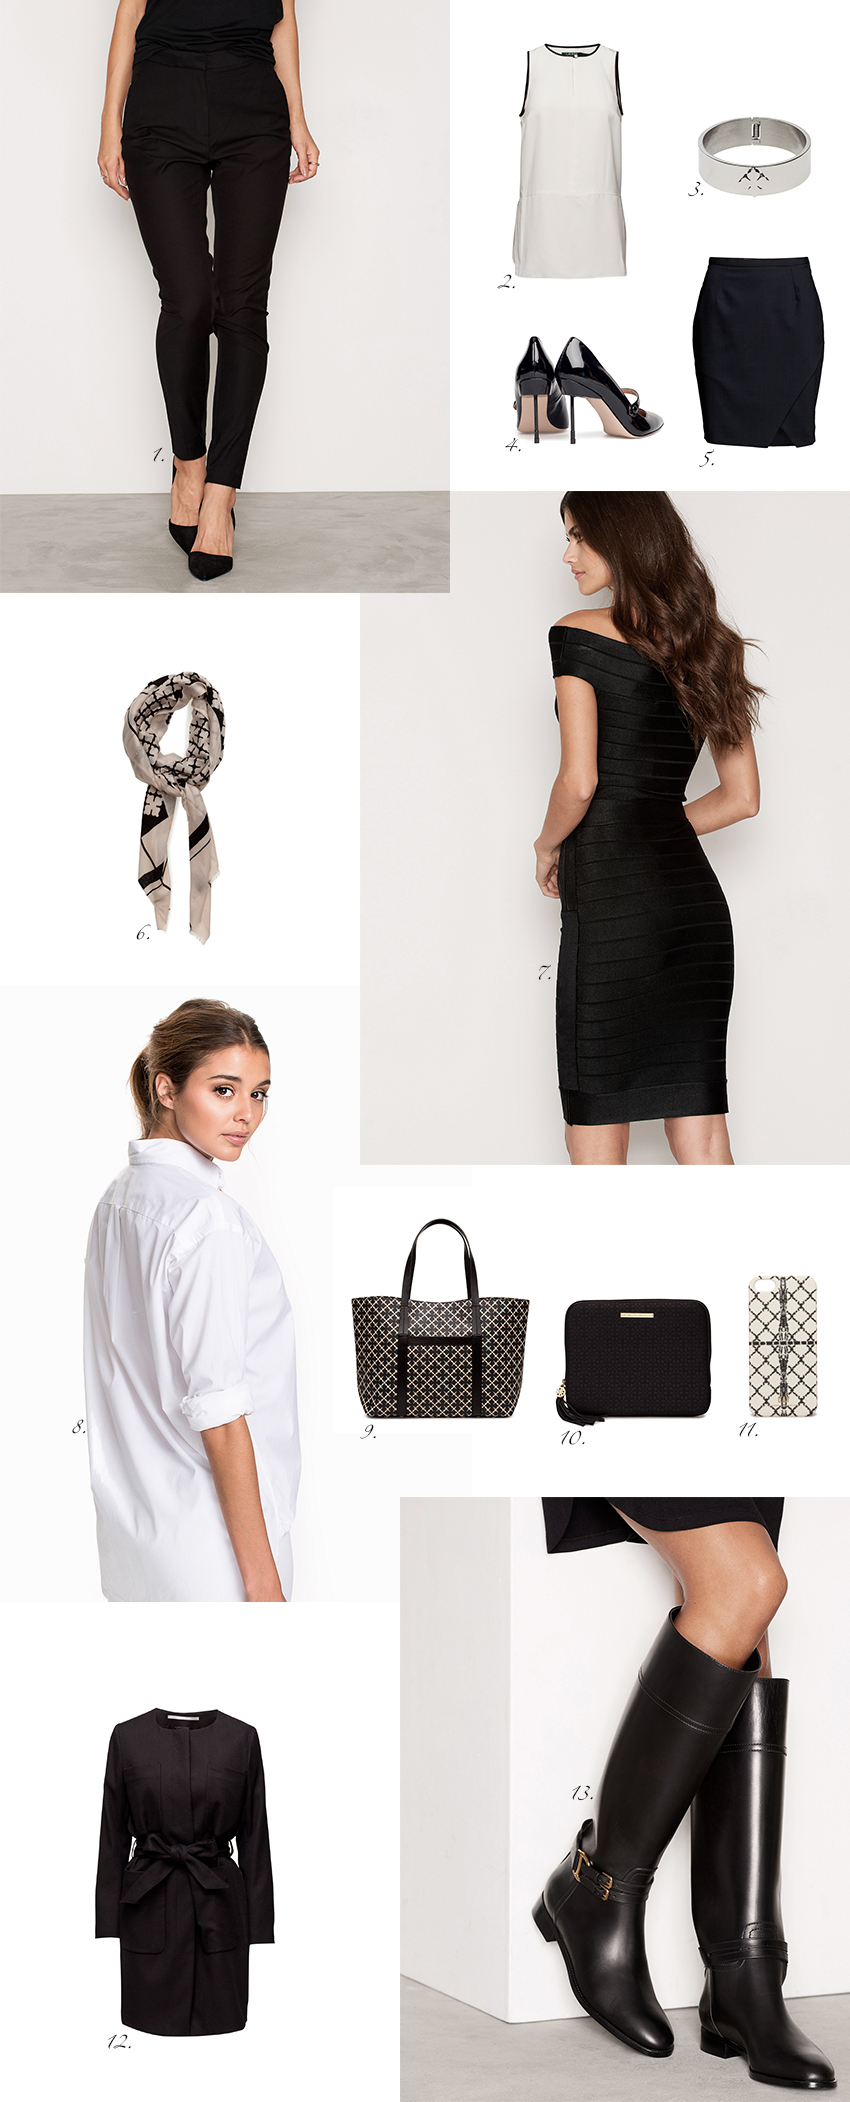 Sale finds to a classic wardrobe now on the blog: //www.idealista.fi/charandthecity/2016/12/29/vaatekaapin-klassikot-alesta